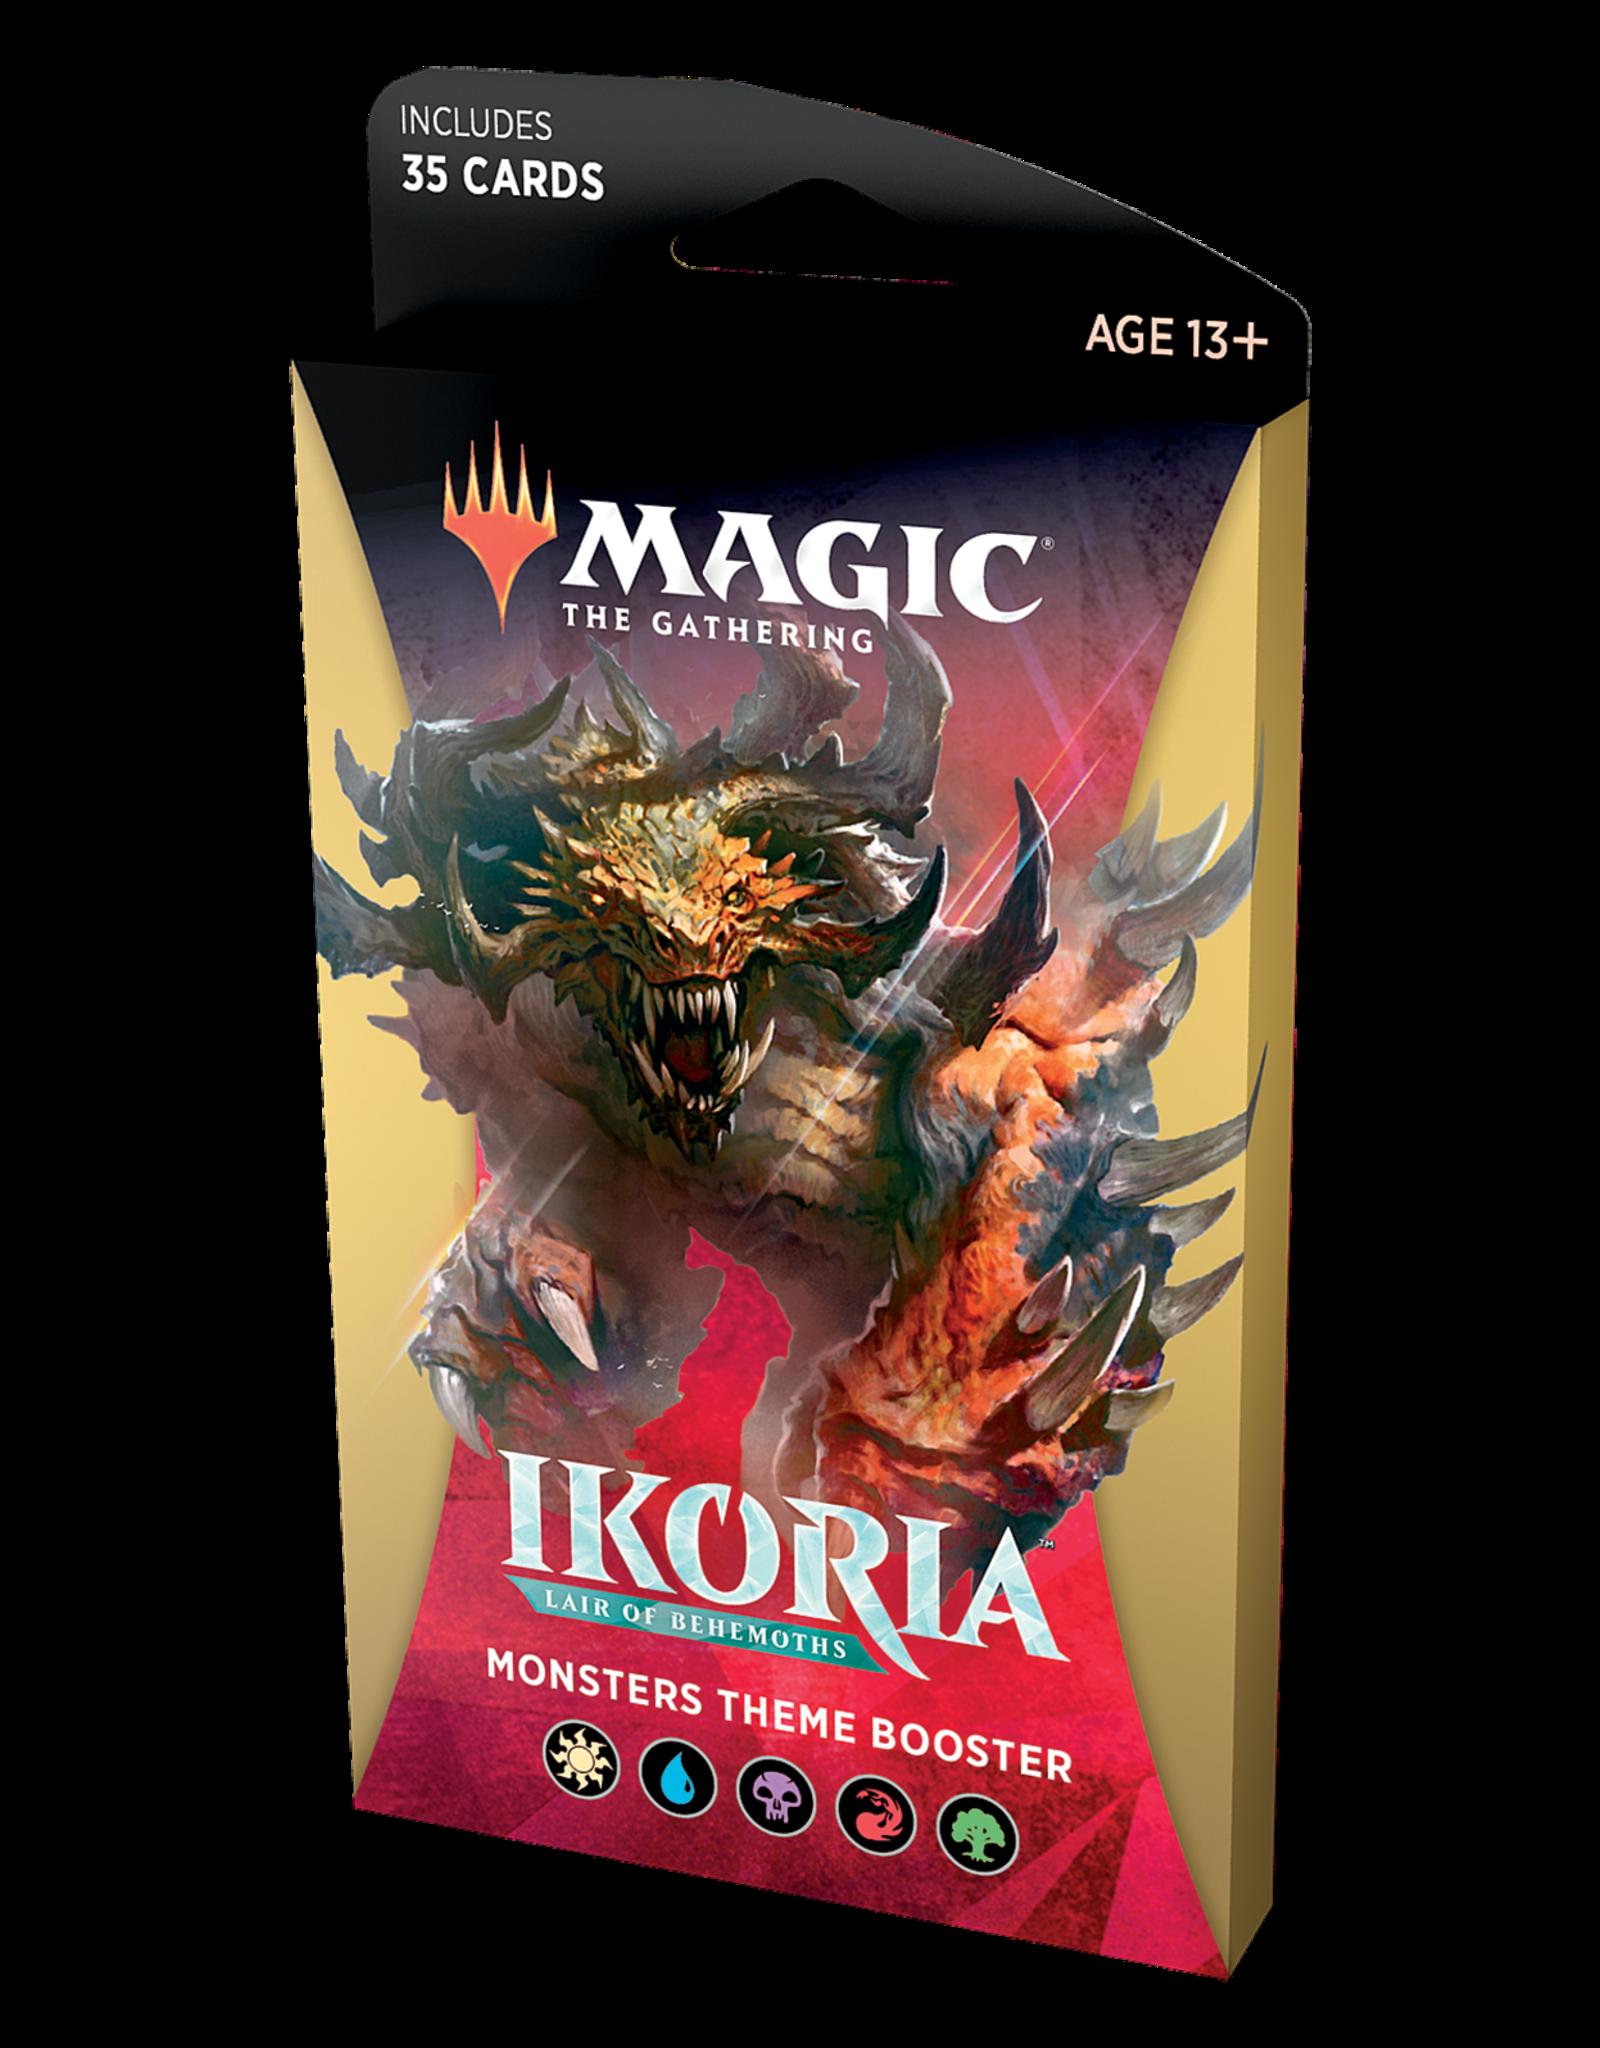 Magic: The Gathering Magic: The Gathering - Ikoria: Lair of Behemoths - Theme Booster